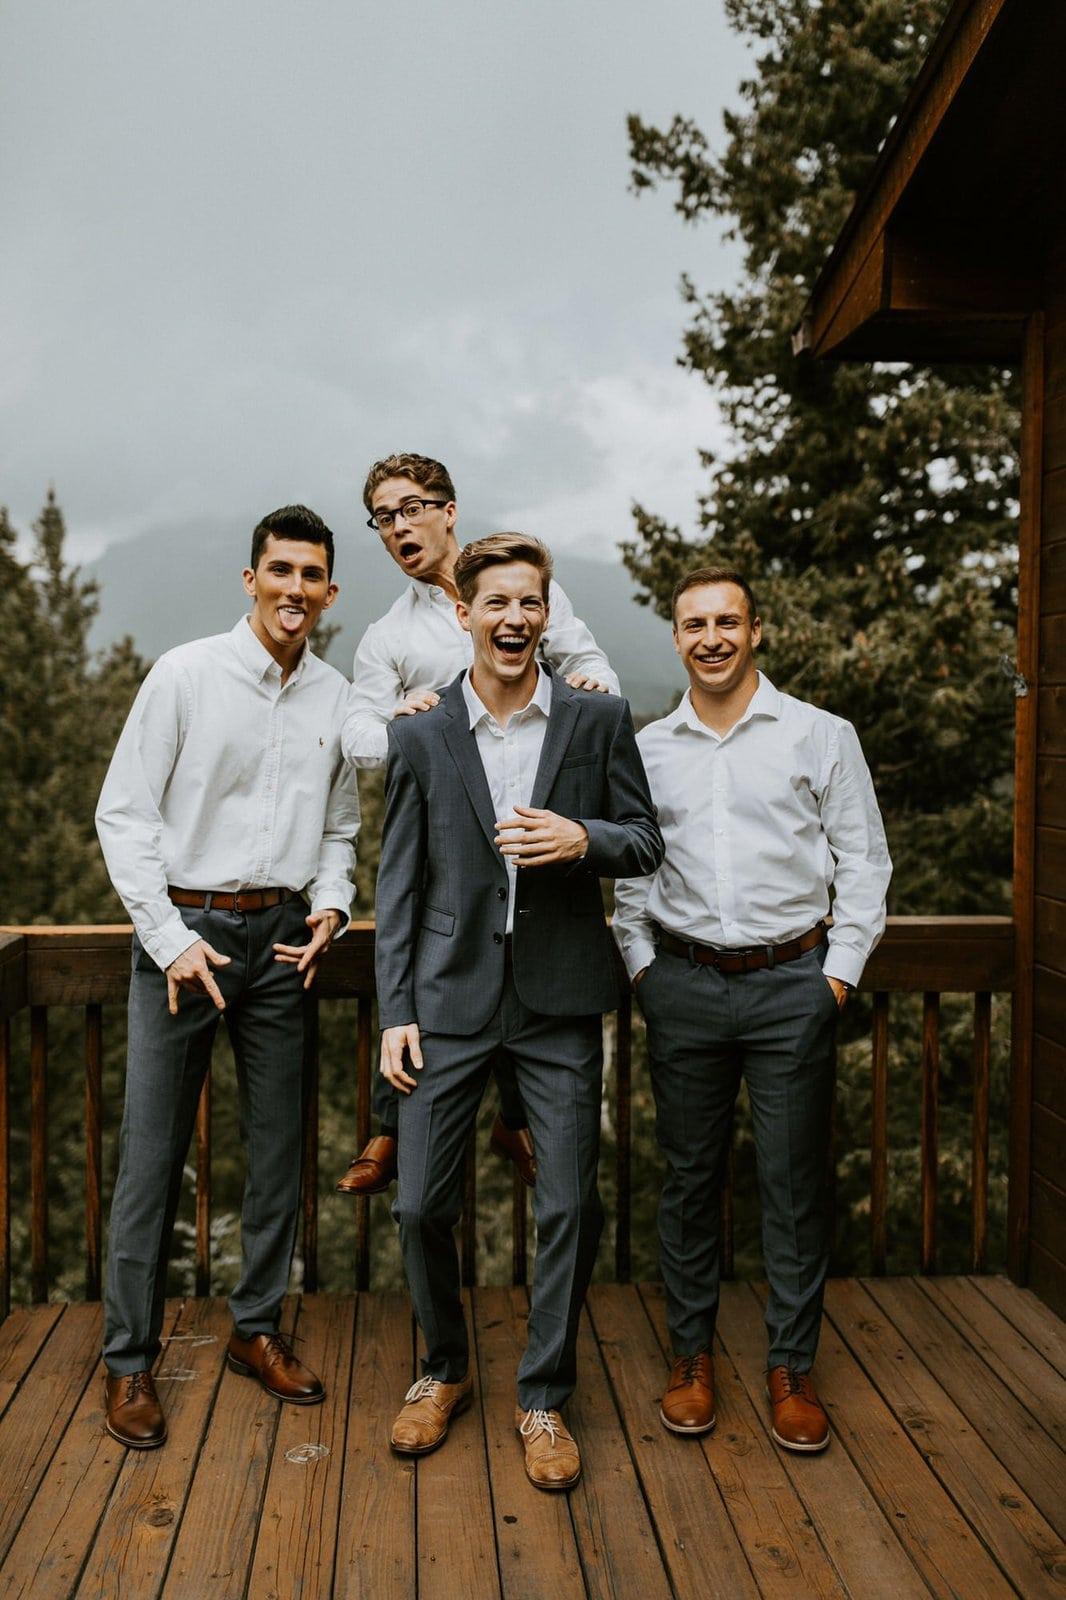 groom and groomsmen photography.